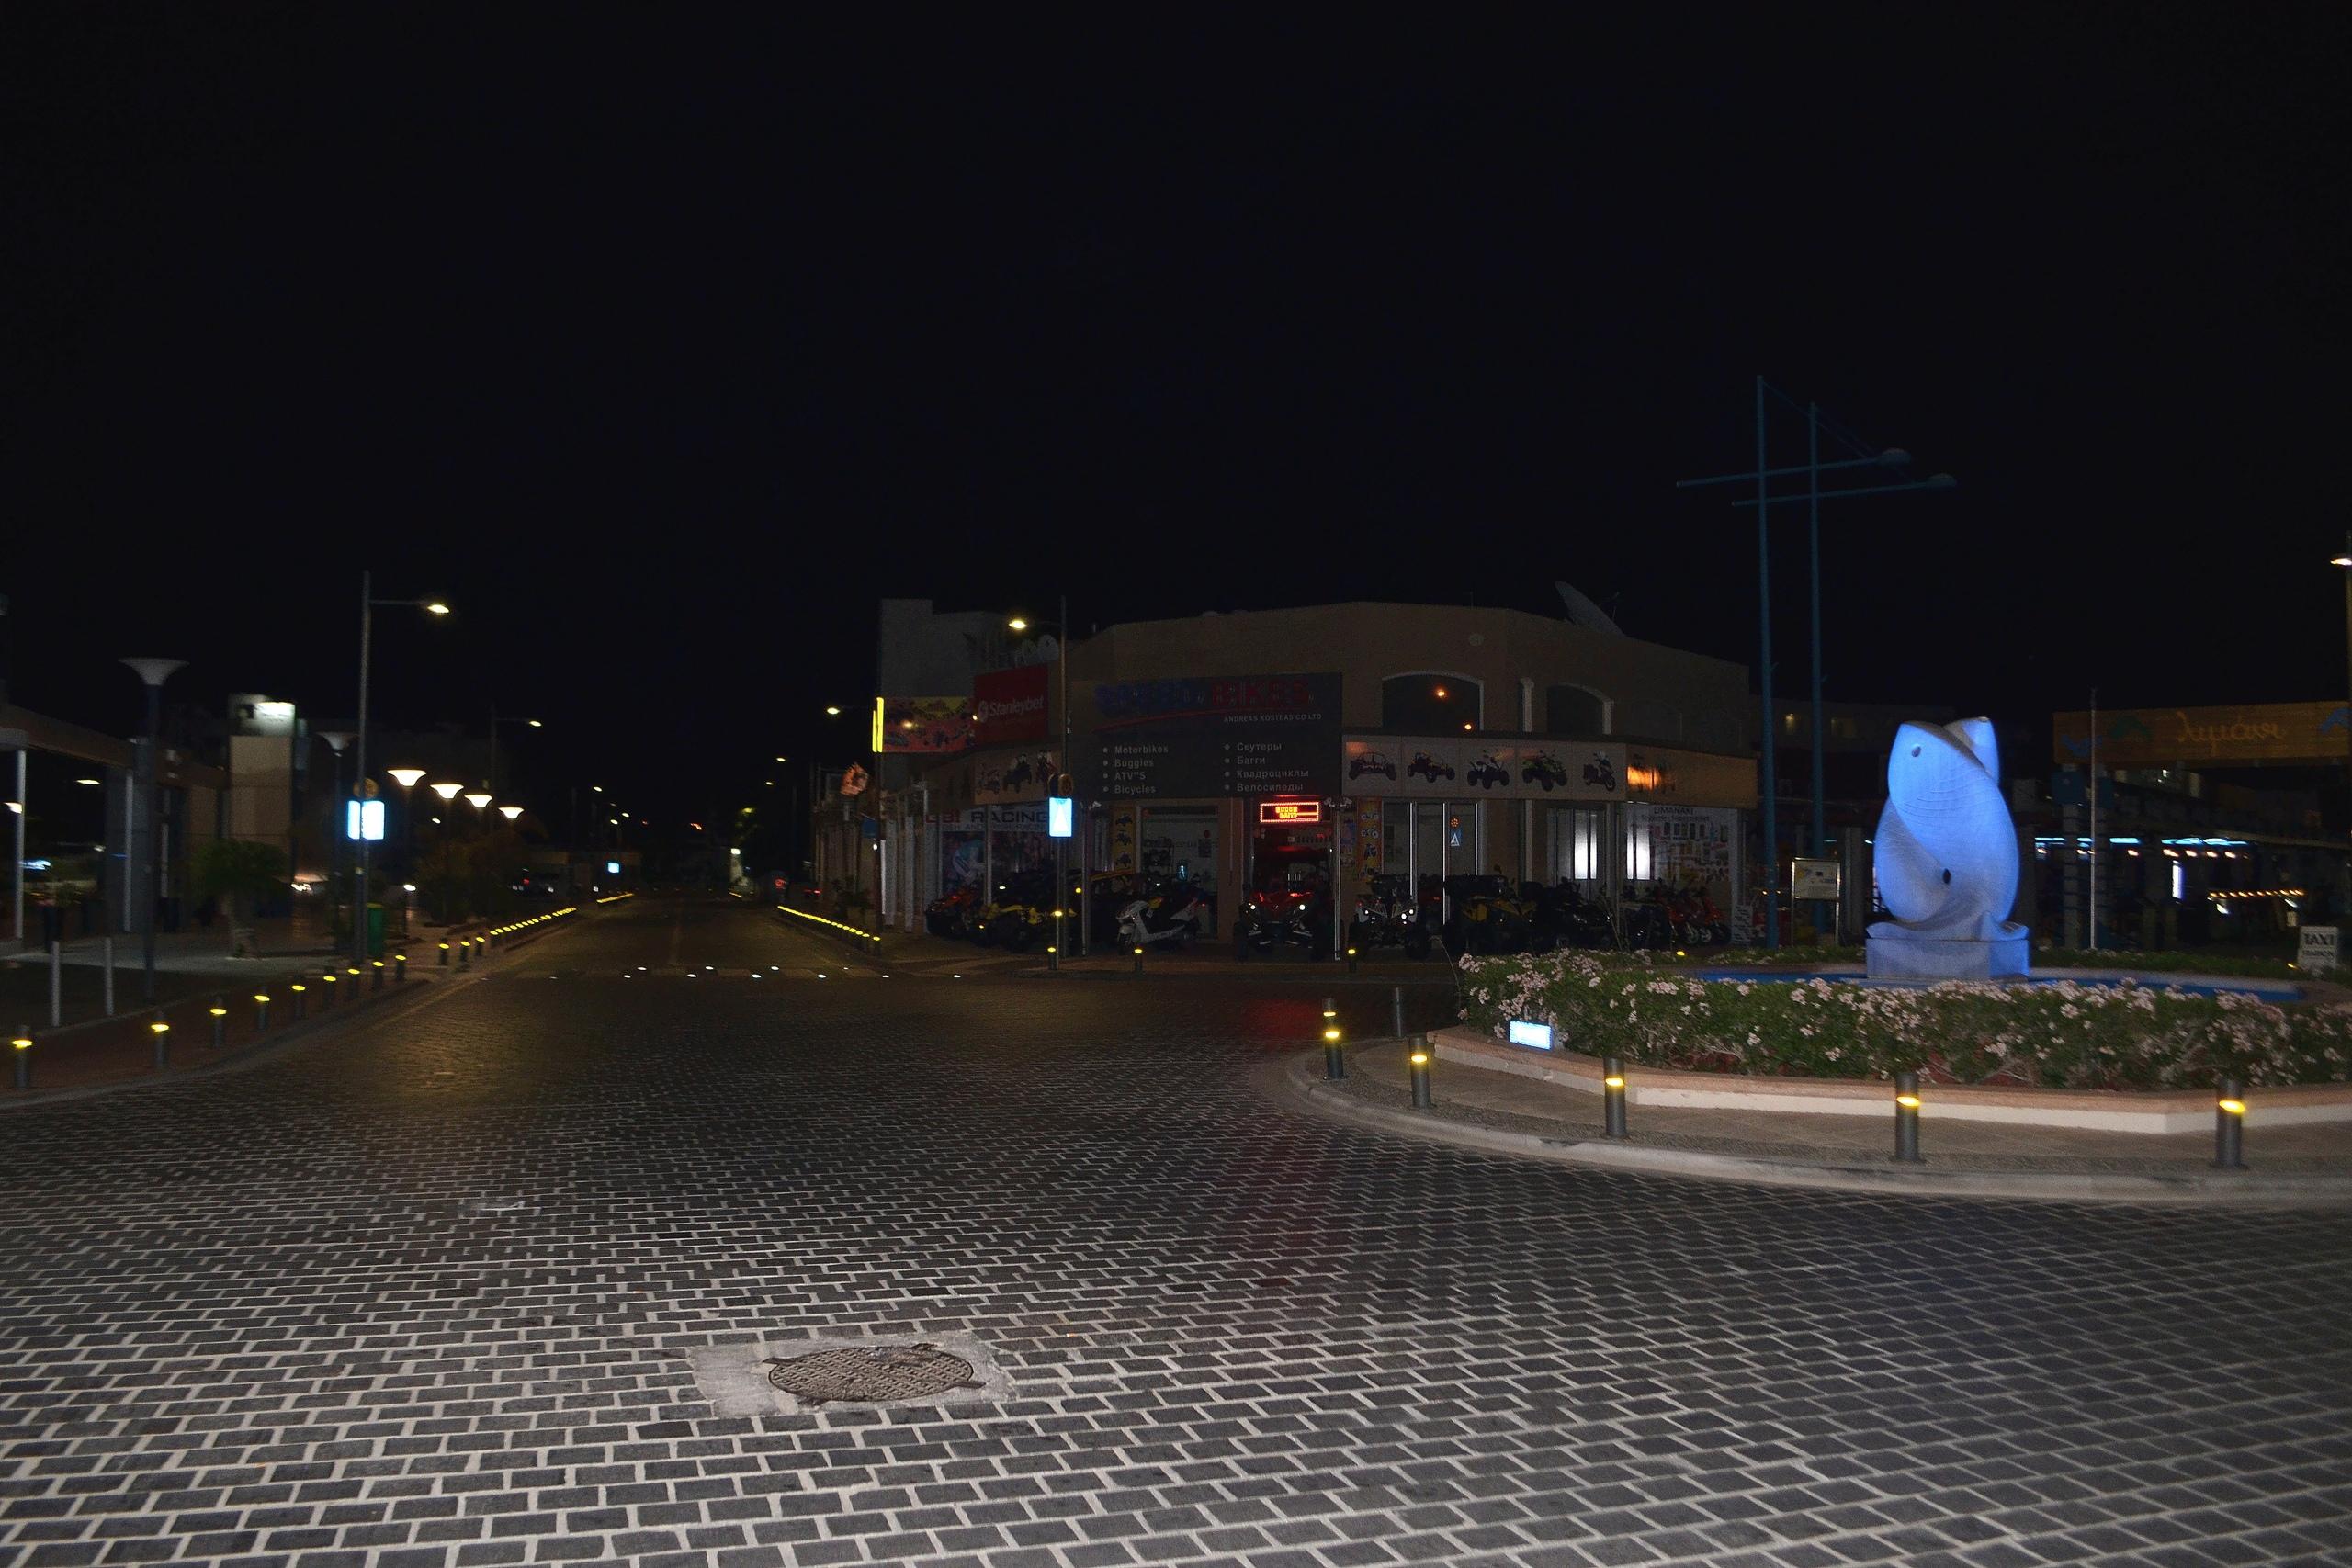 Елена Руденко (Валтея). Кипр. Айия-Напа (фото). - Страница 2 GeVGwS9Y0io